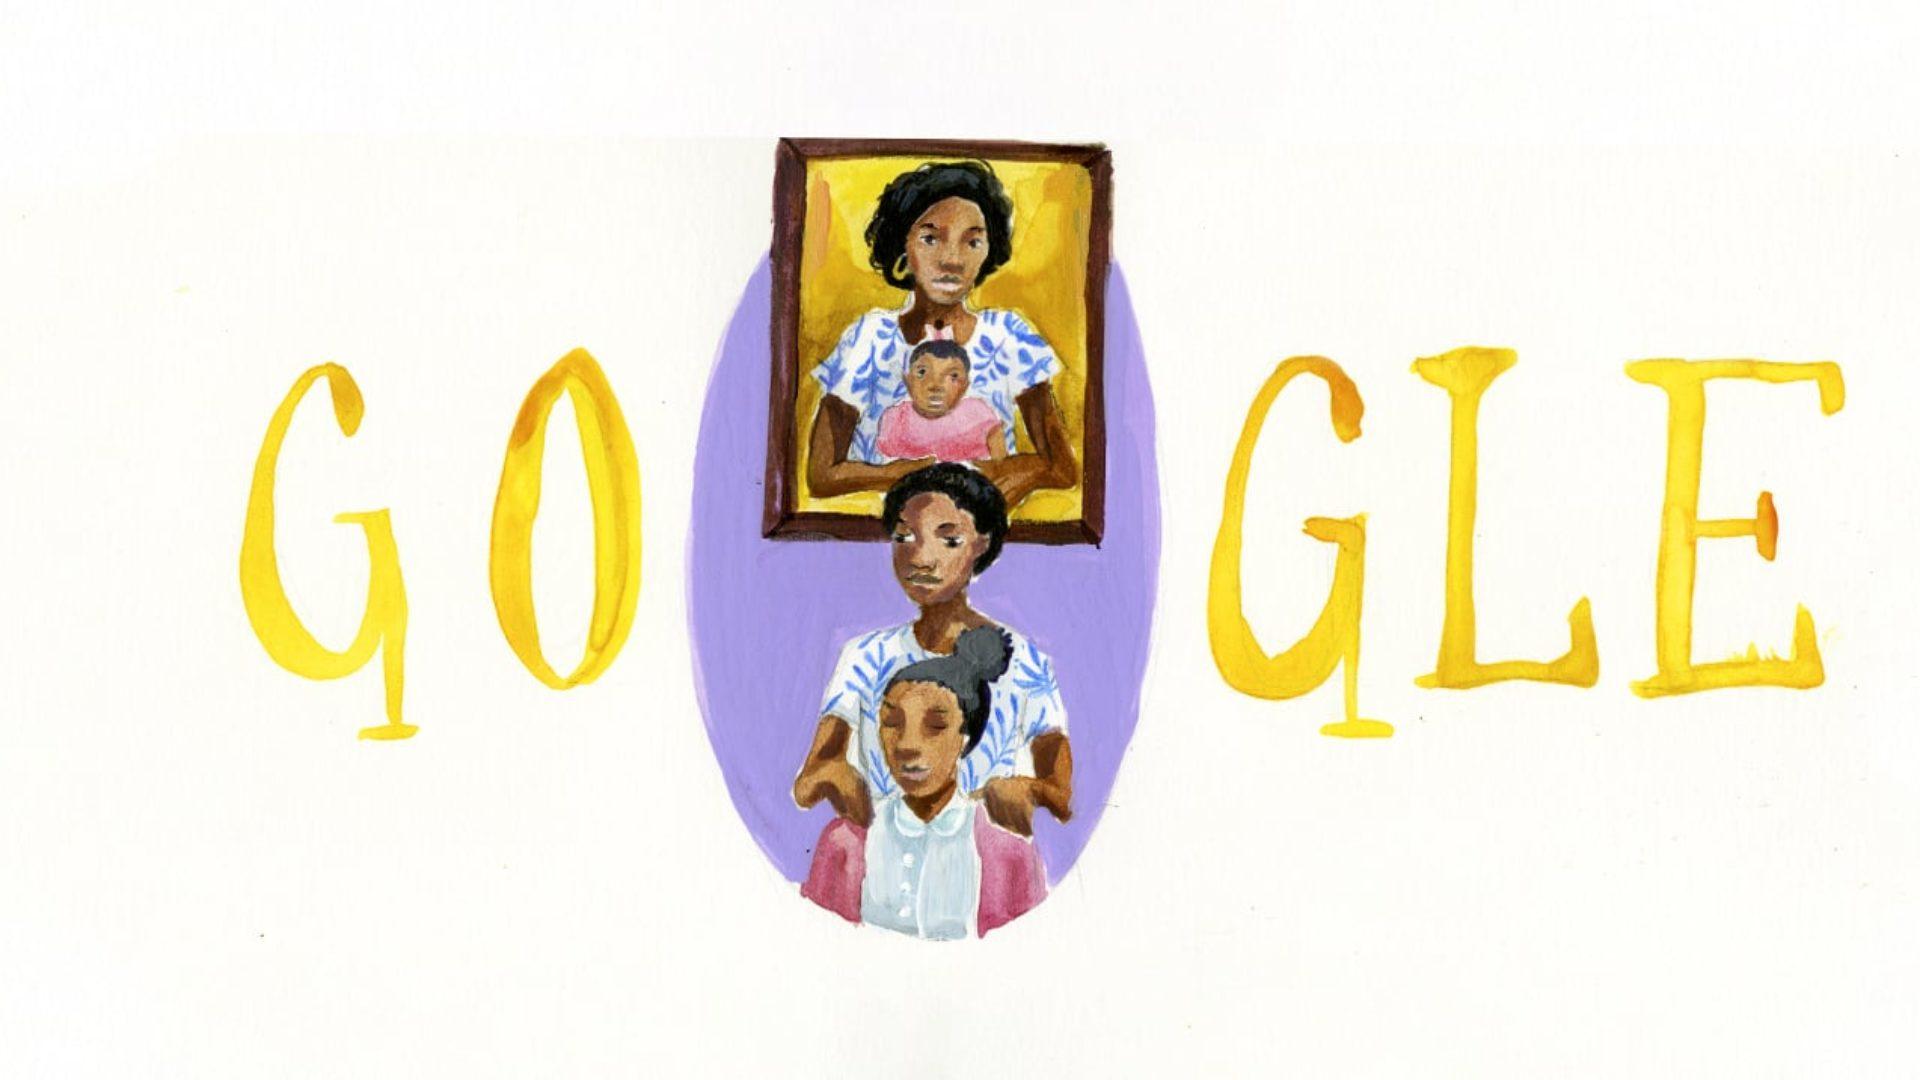 Georiga Teen Honors Mother In Prize-Winning Doodle For Google